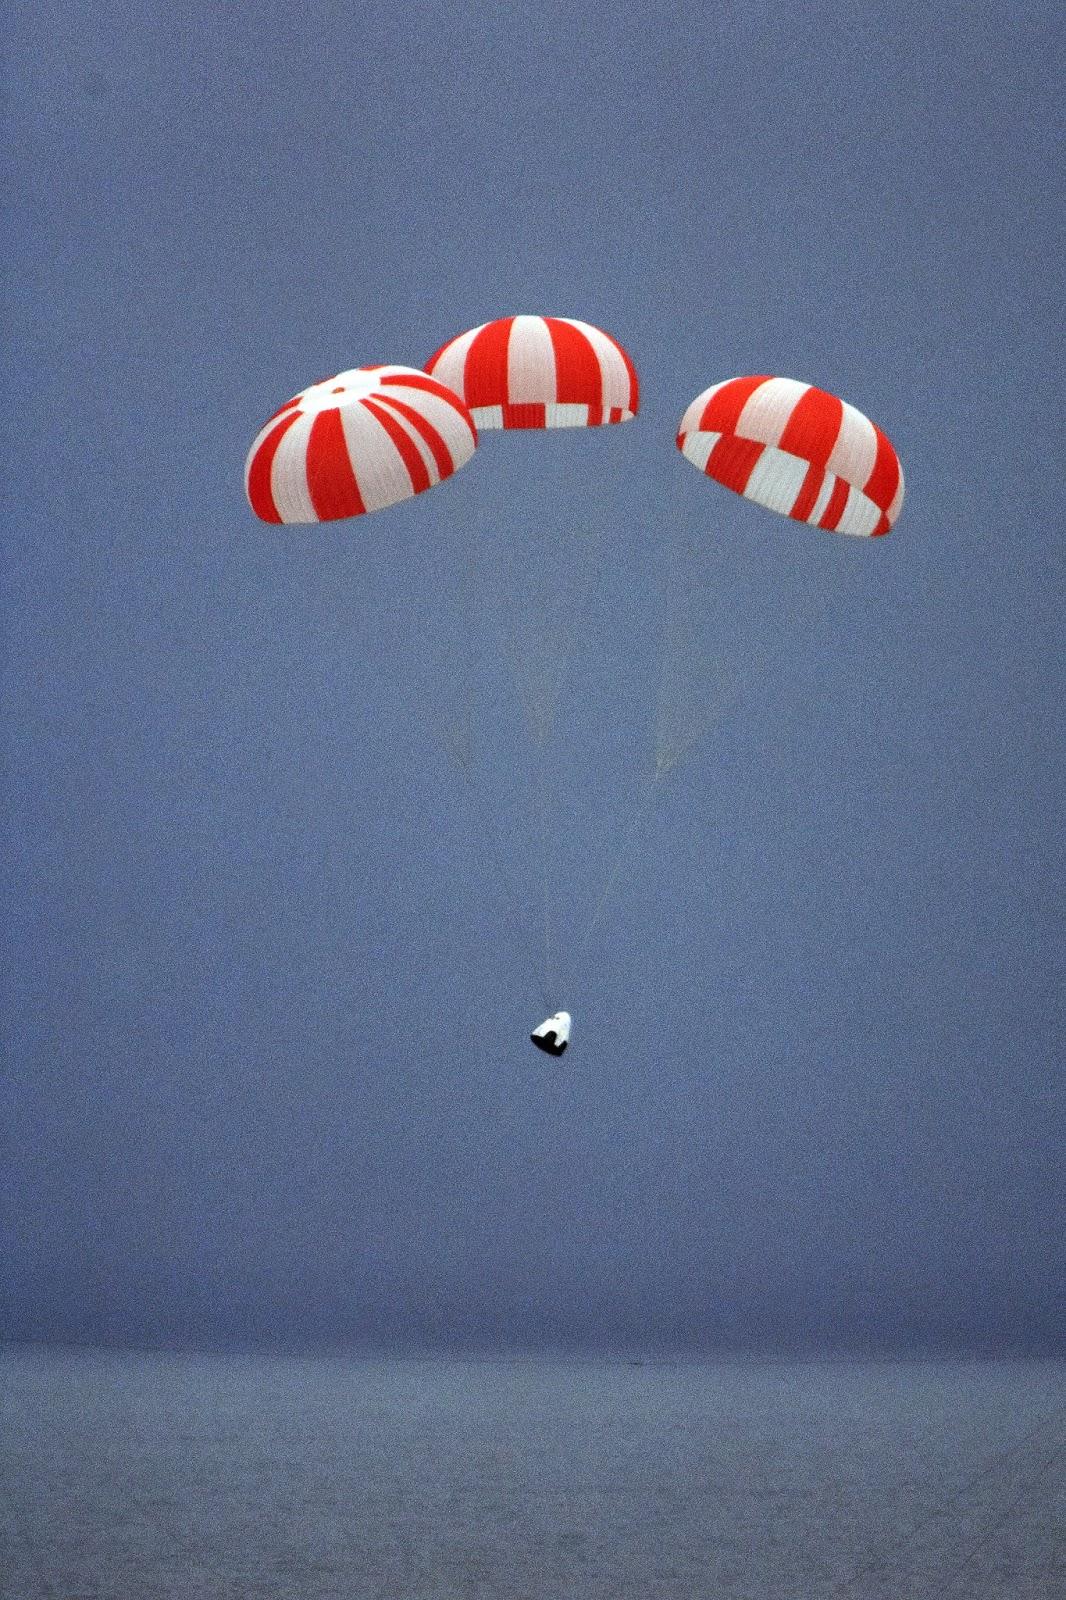 SpaceX's Crew Dragon spacecraft deploys parachutes before splashdown. Credit: SpaceX